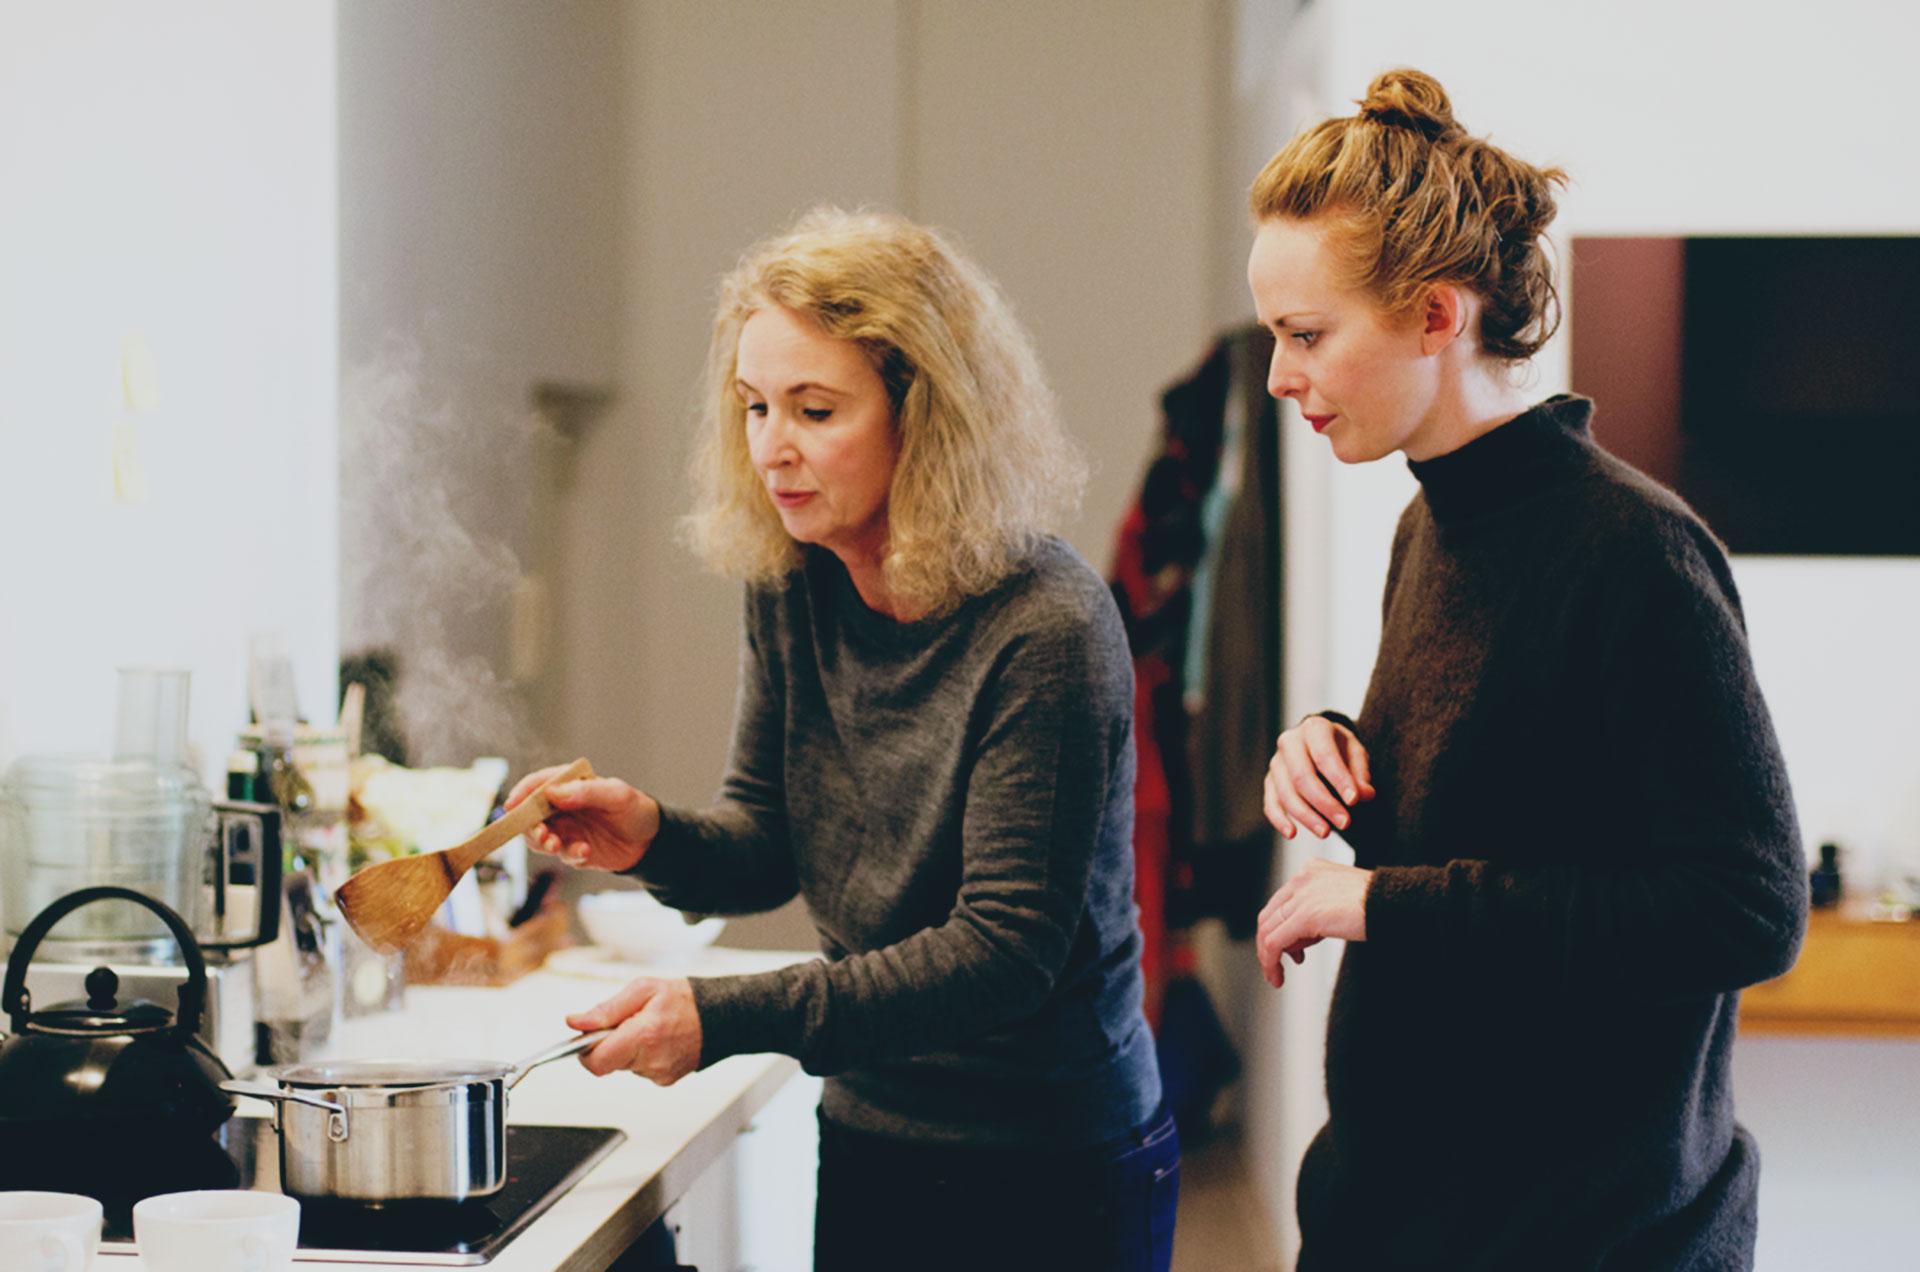 Foodadit-recipe-Alanna-Lawley-Sally-Ross-Clark-kuzu-Berlin-stirring